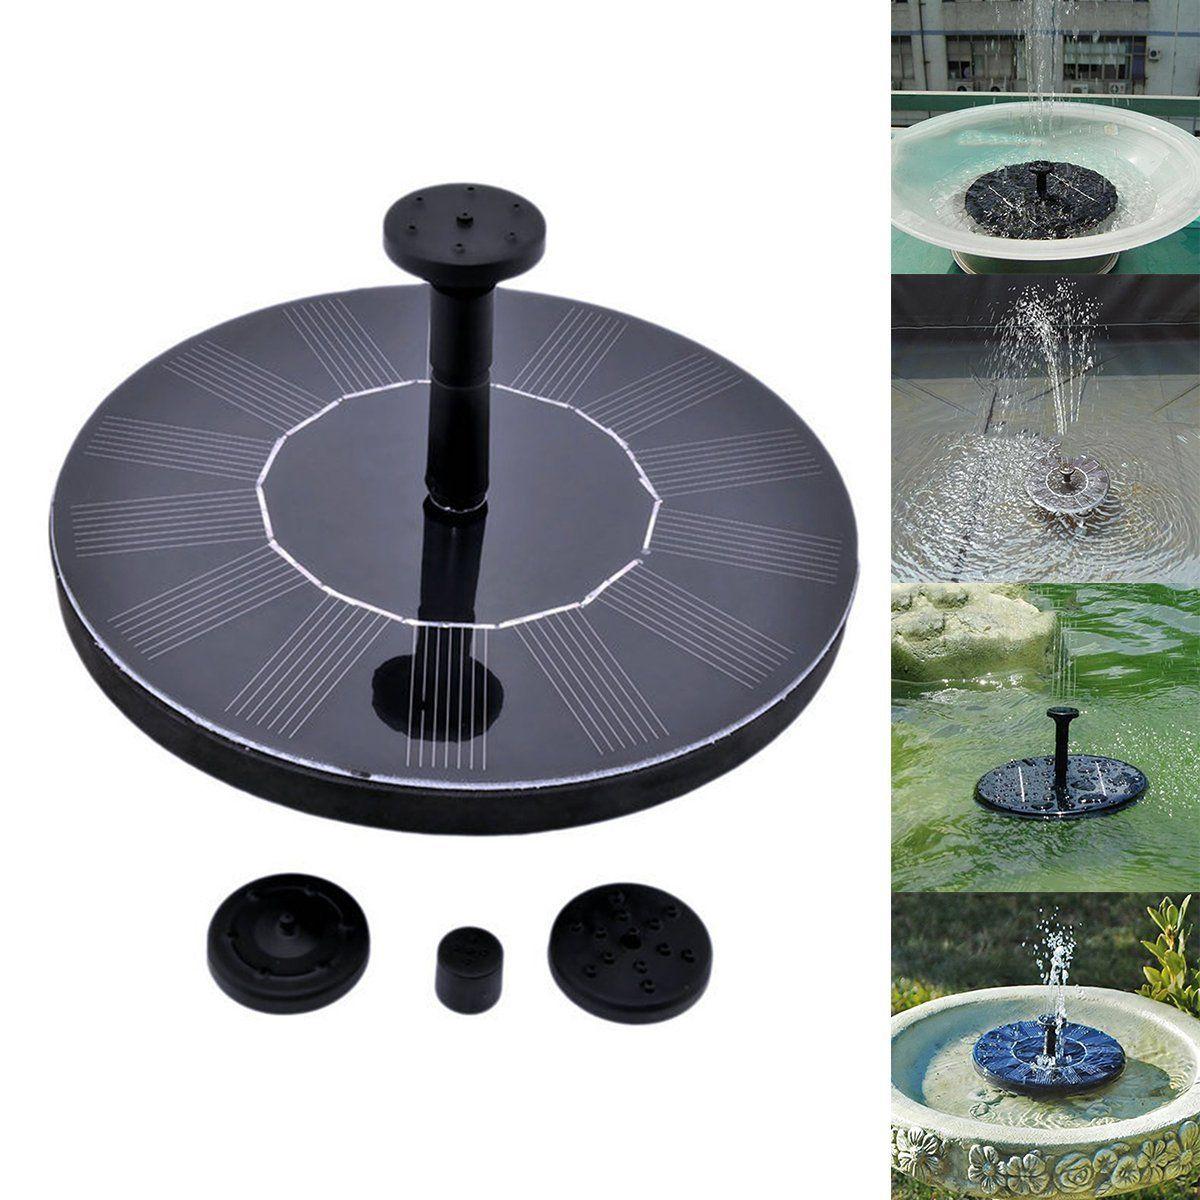 Solar Power Fountain Pump Floating Drifting Panel Pool